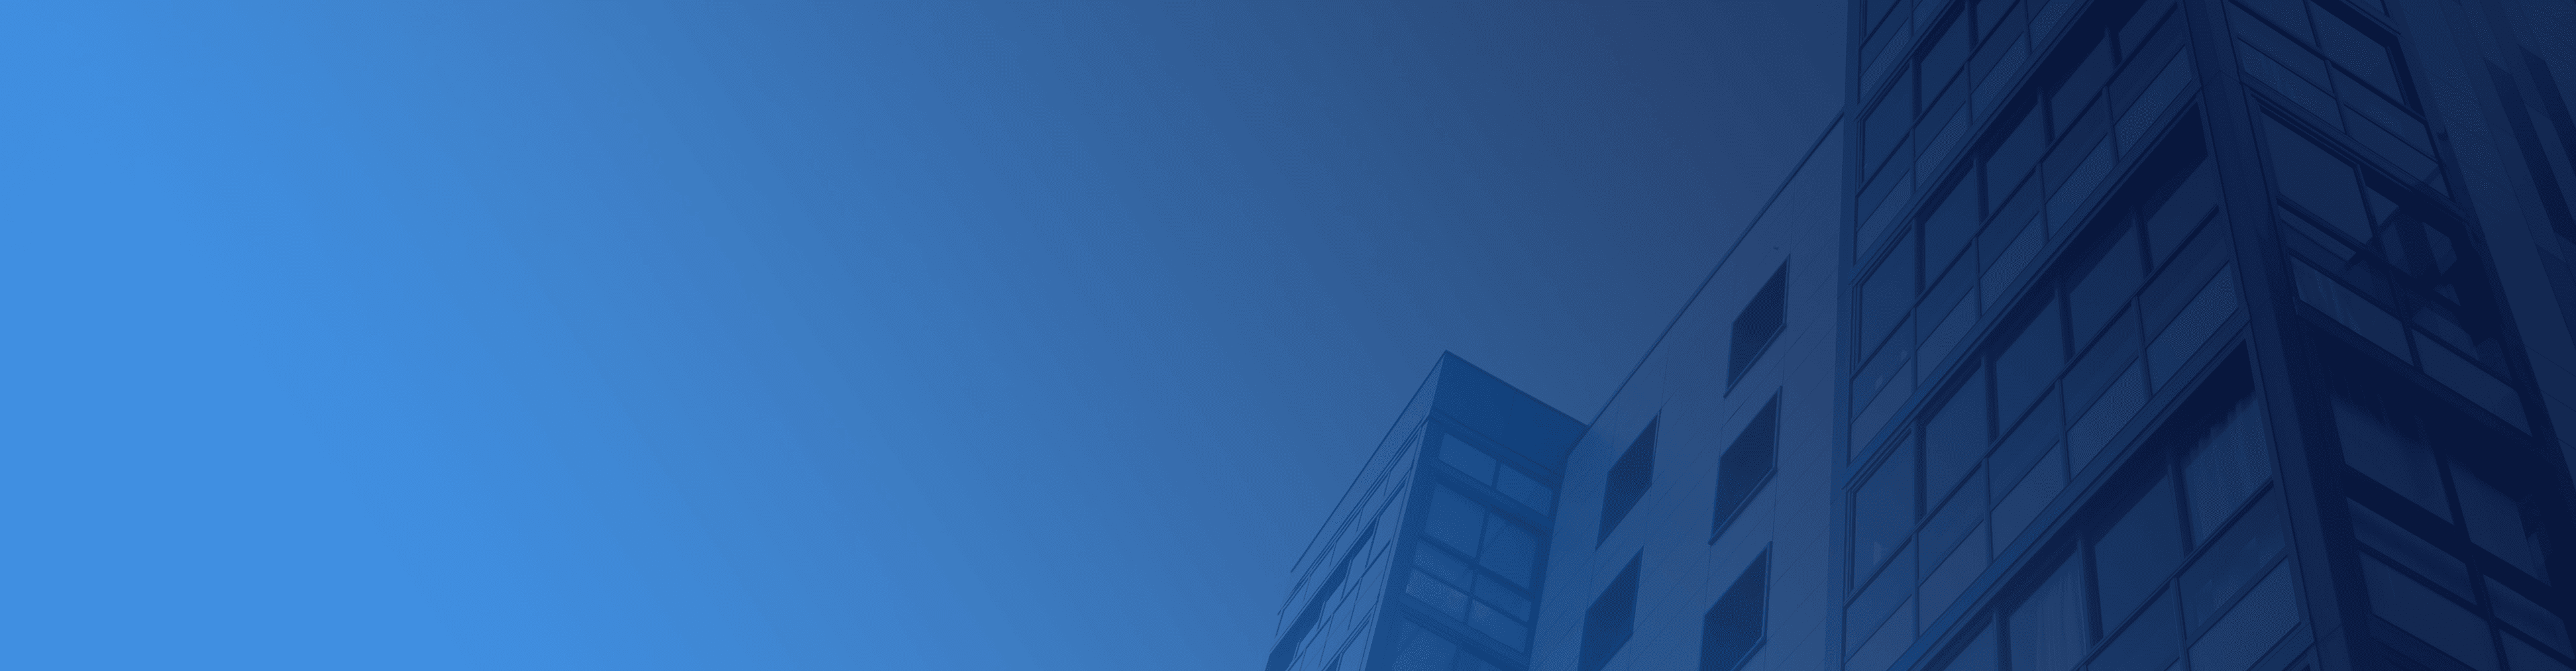 Online workplace app development highlights